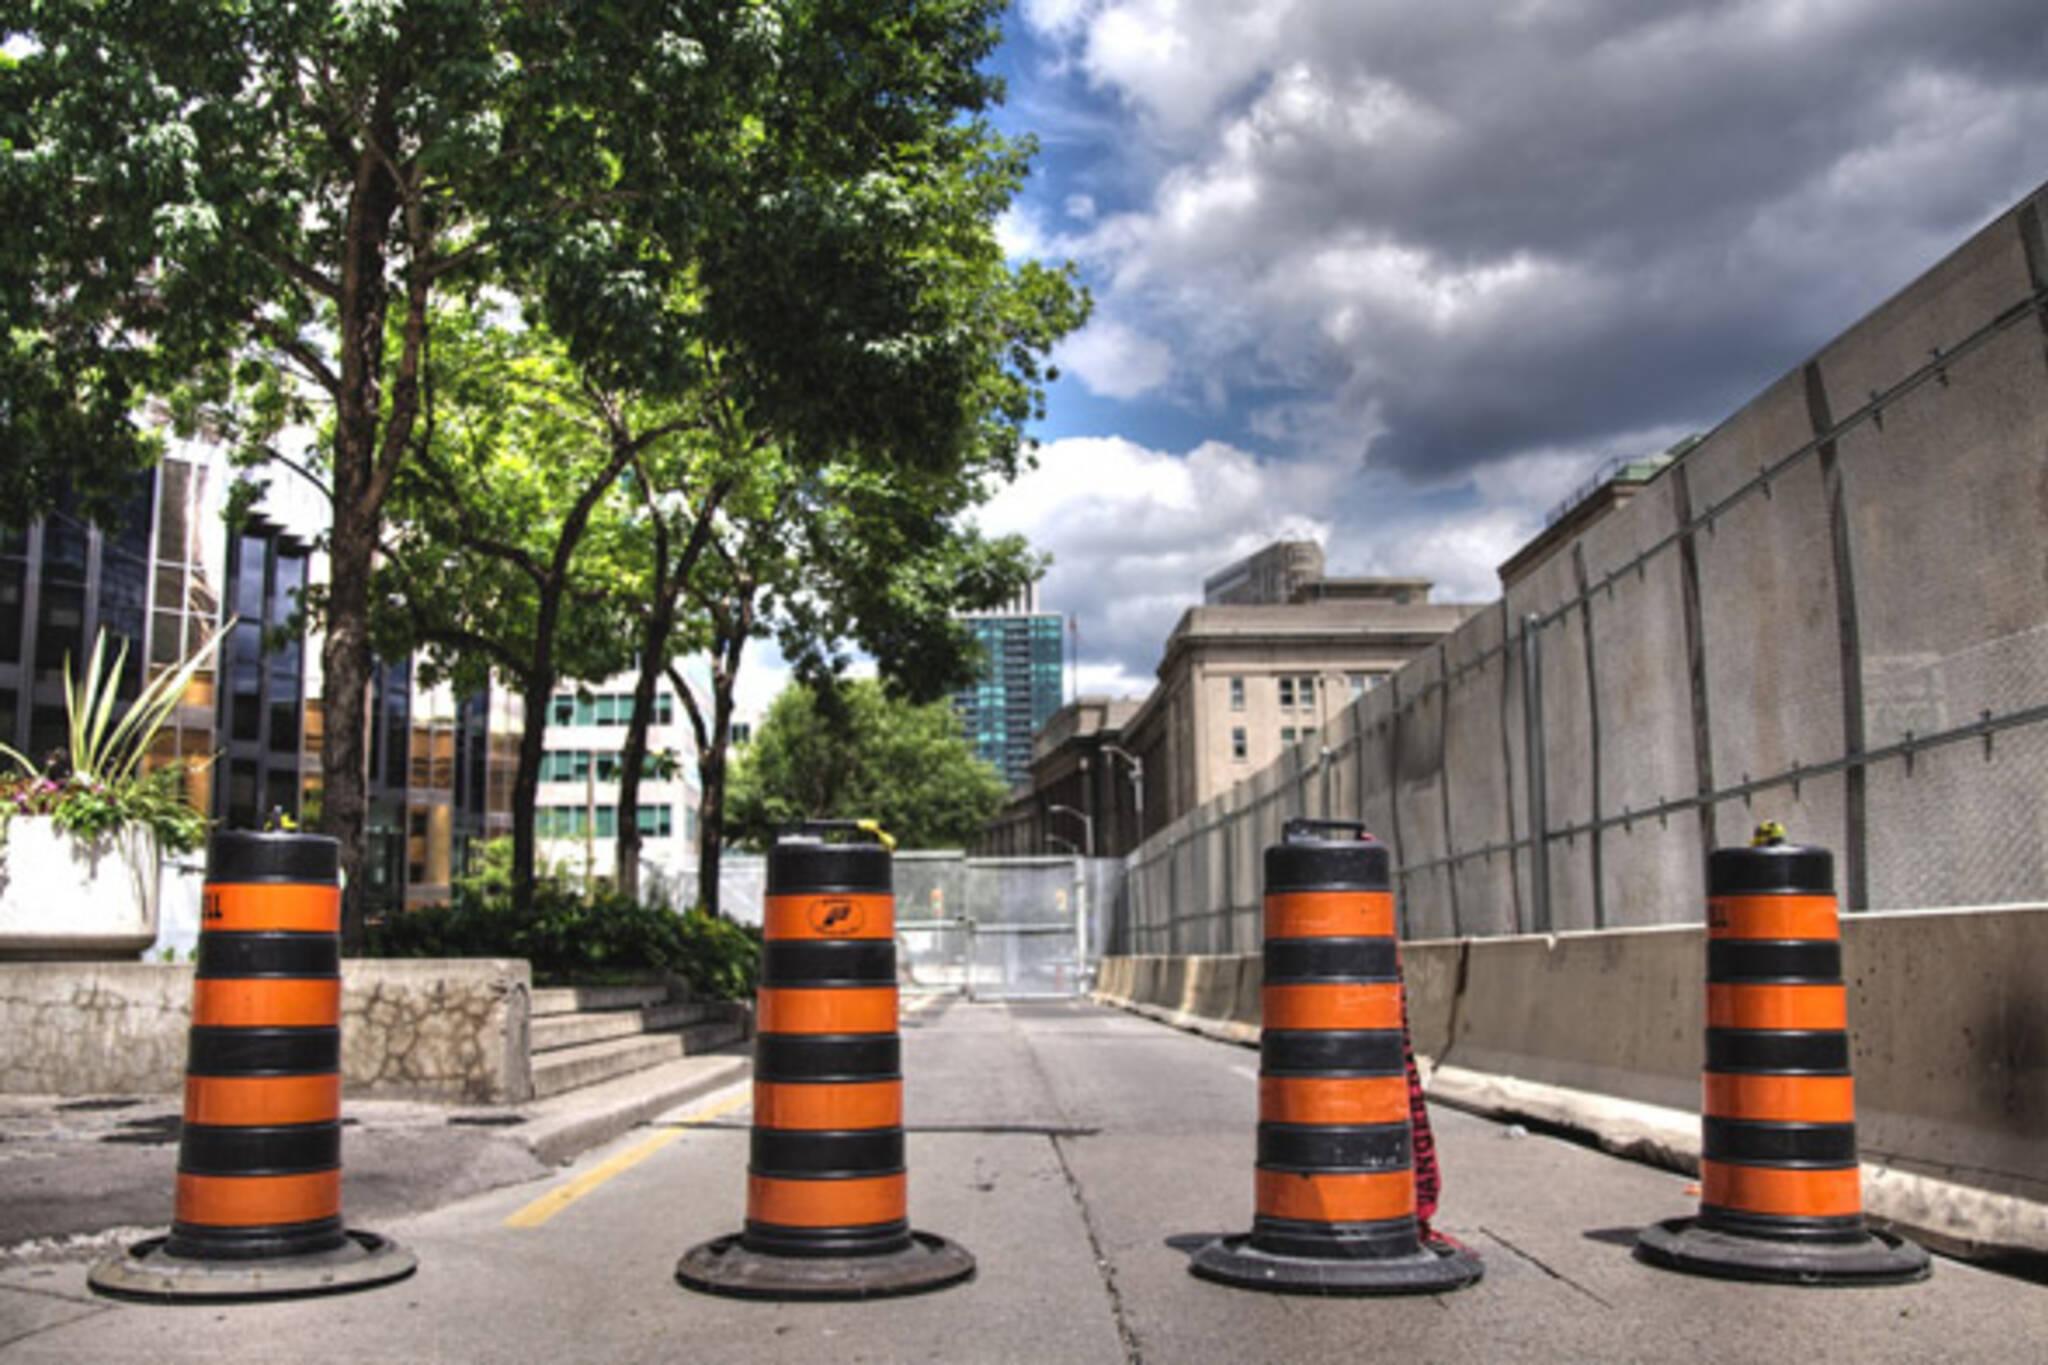 G20 Toronto closures